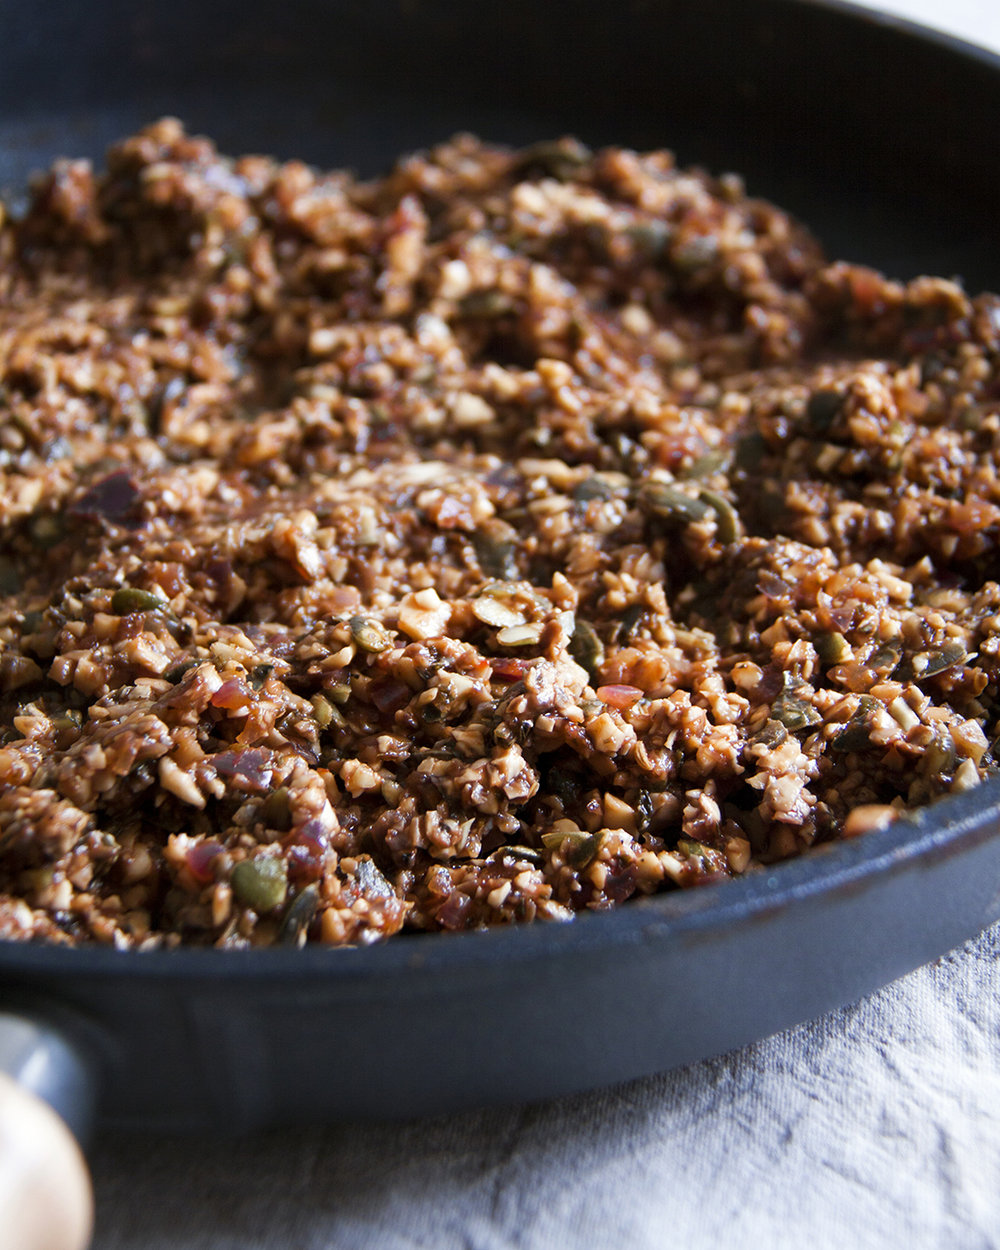 lasagne-champignonragu-hennep-bechamel-vegan-whole-foods-olievrij-03.jpg